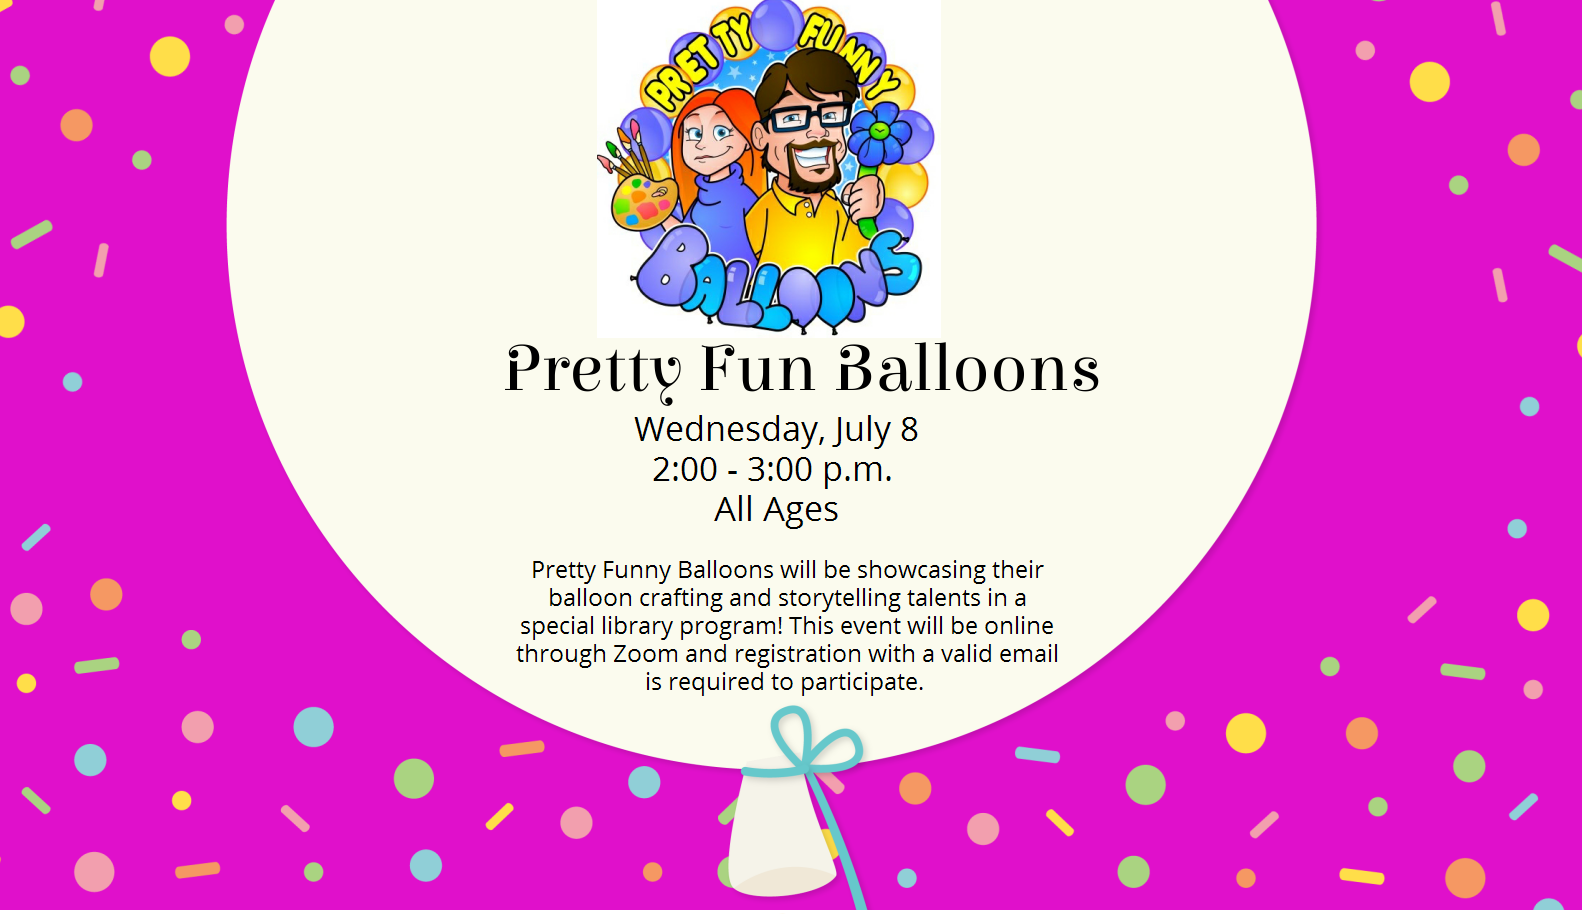 Pretty Funny Balloons